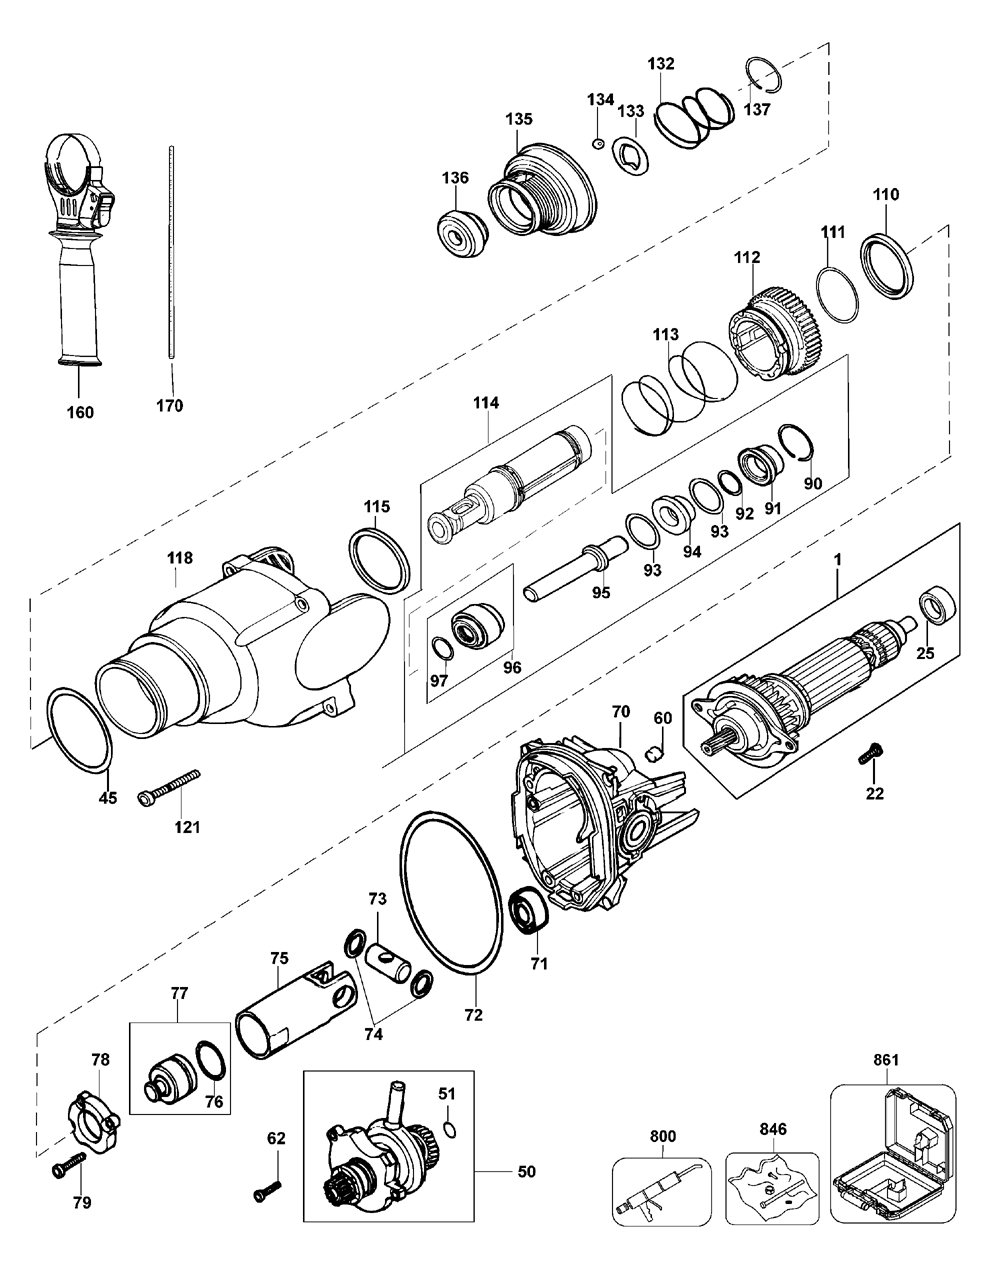 D25201K-Dewalt-T1-PB-1Break Down